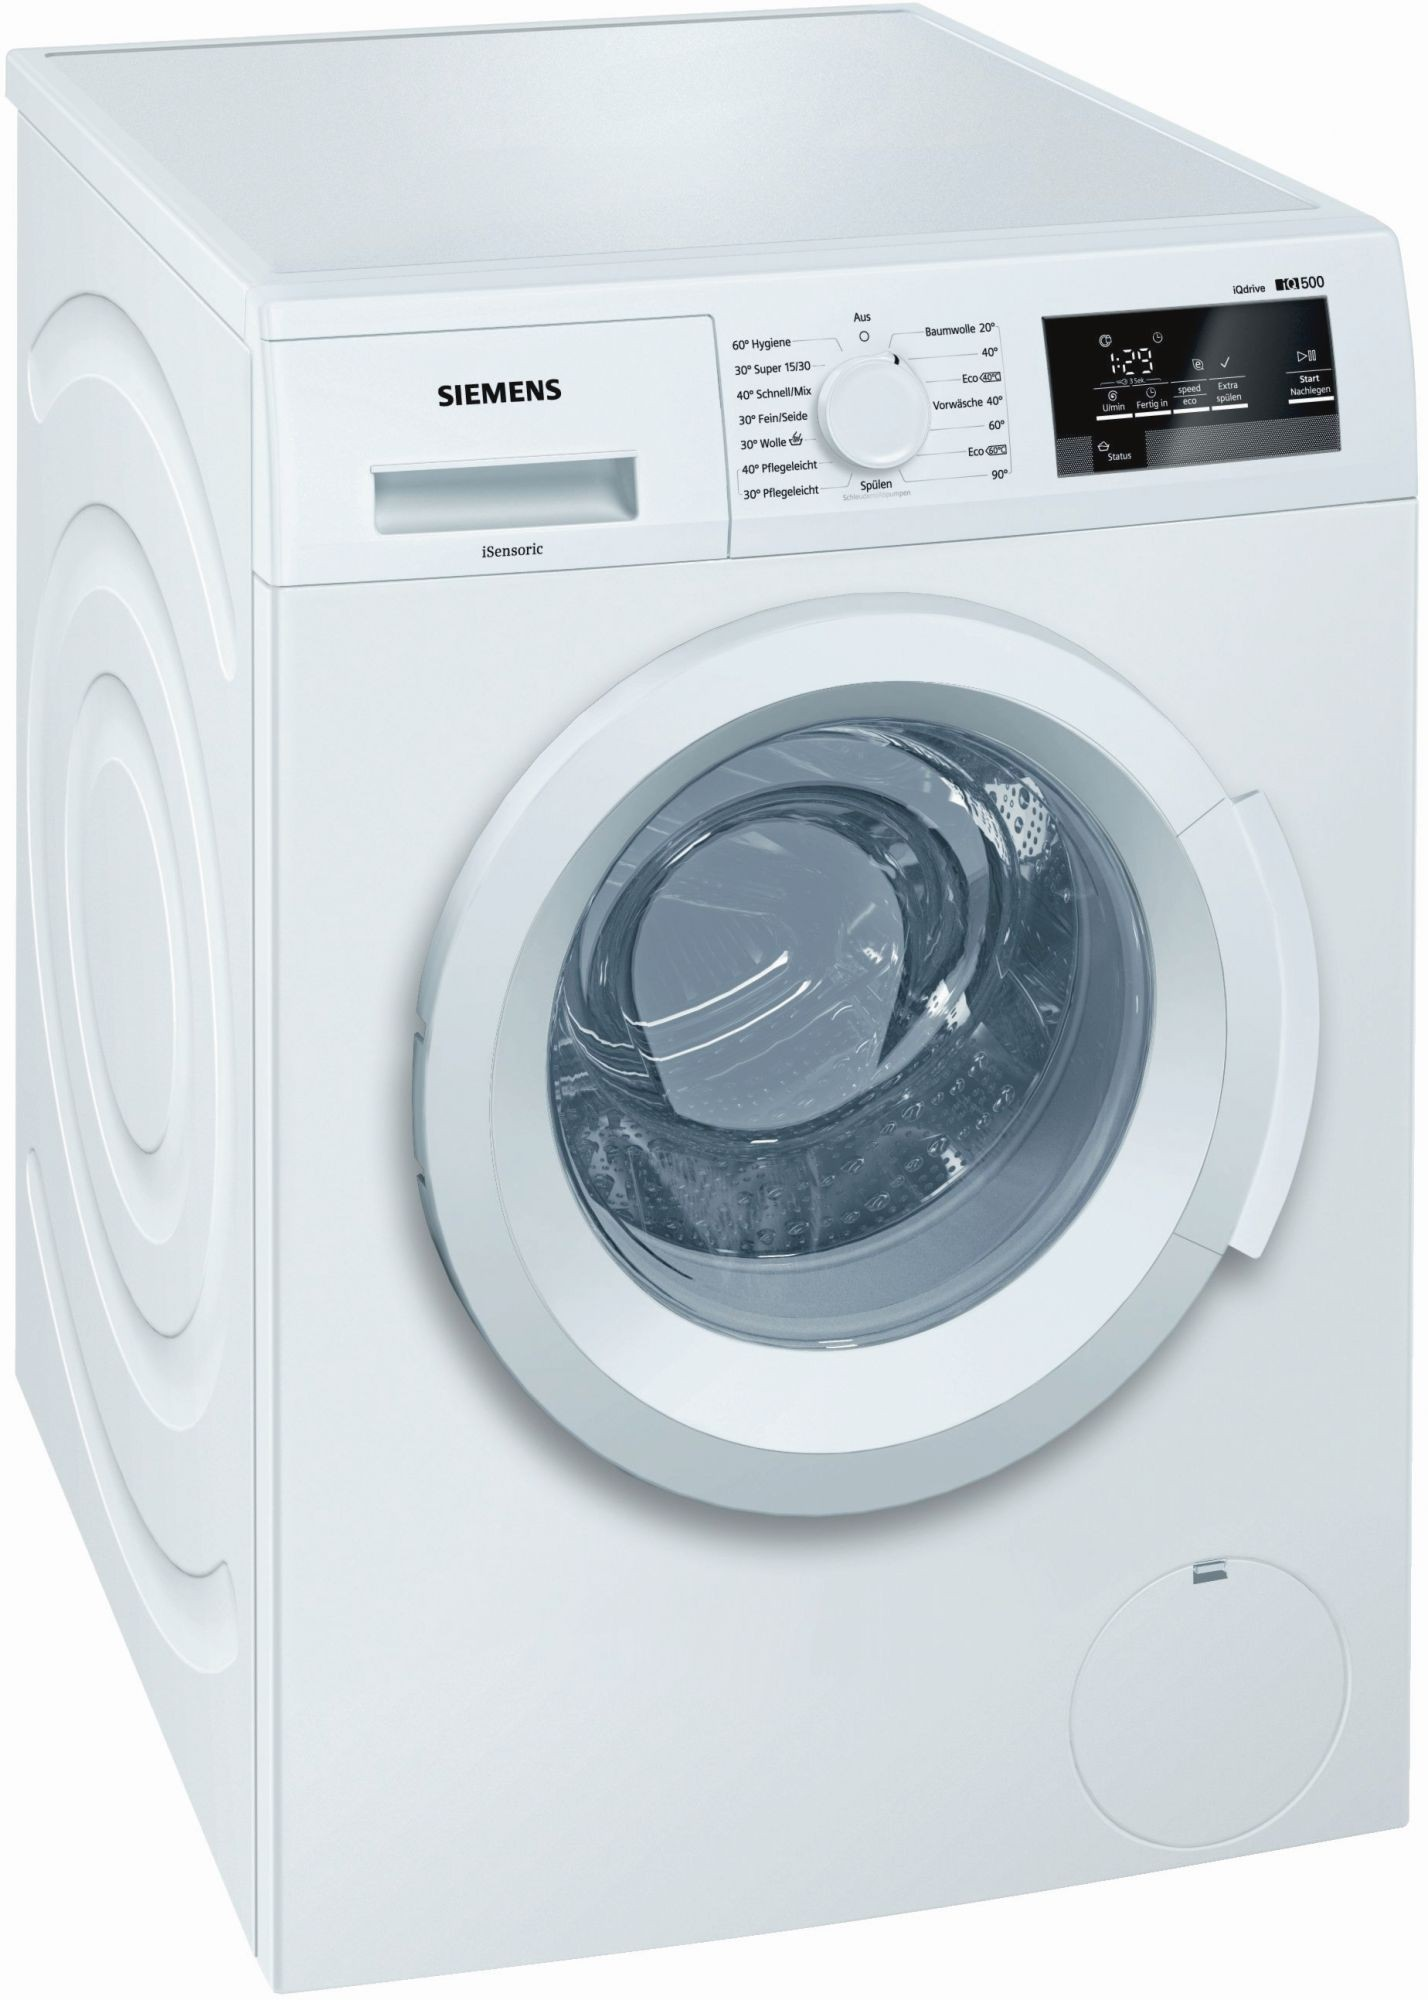 teamsix wm14t320 weiss siemens elektro gro stand waschmaschinen. Black Bedroom Furniture Sets. Home Design Ideas